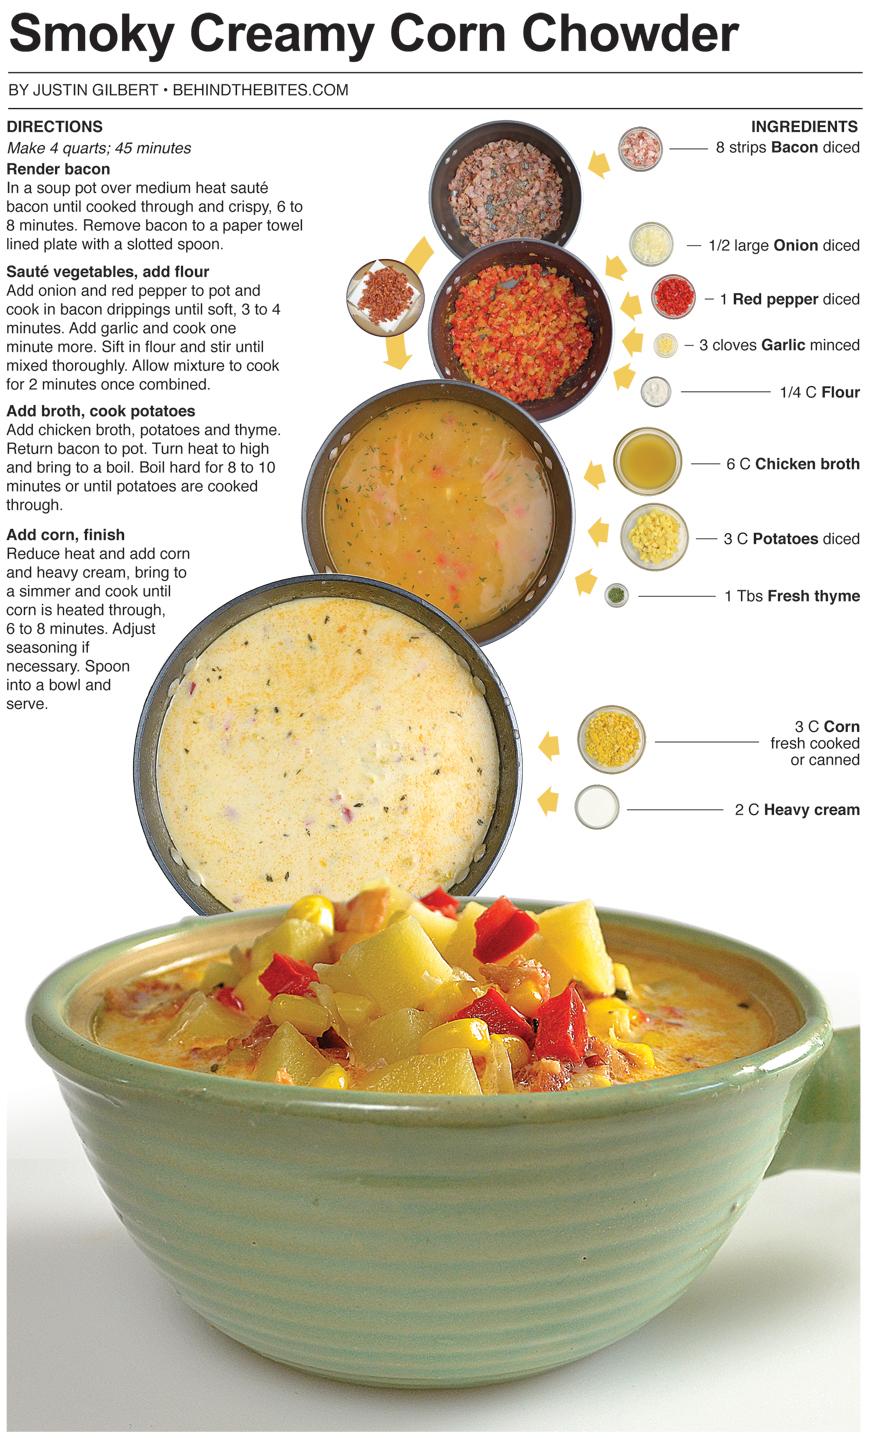 Behind the Bites: Smoky Creamy Corn Chowder